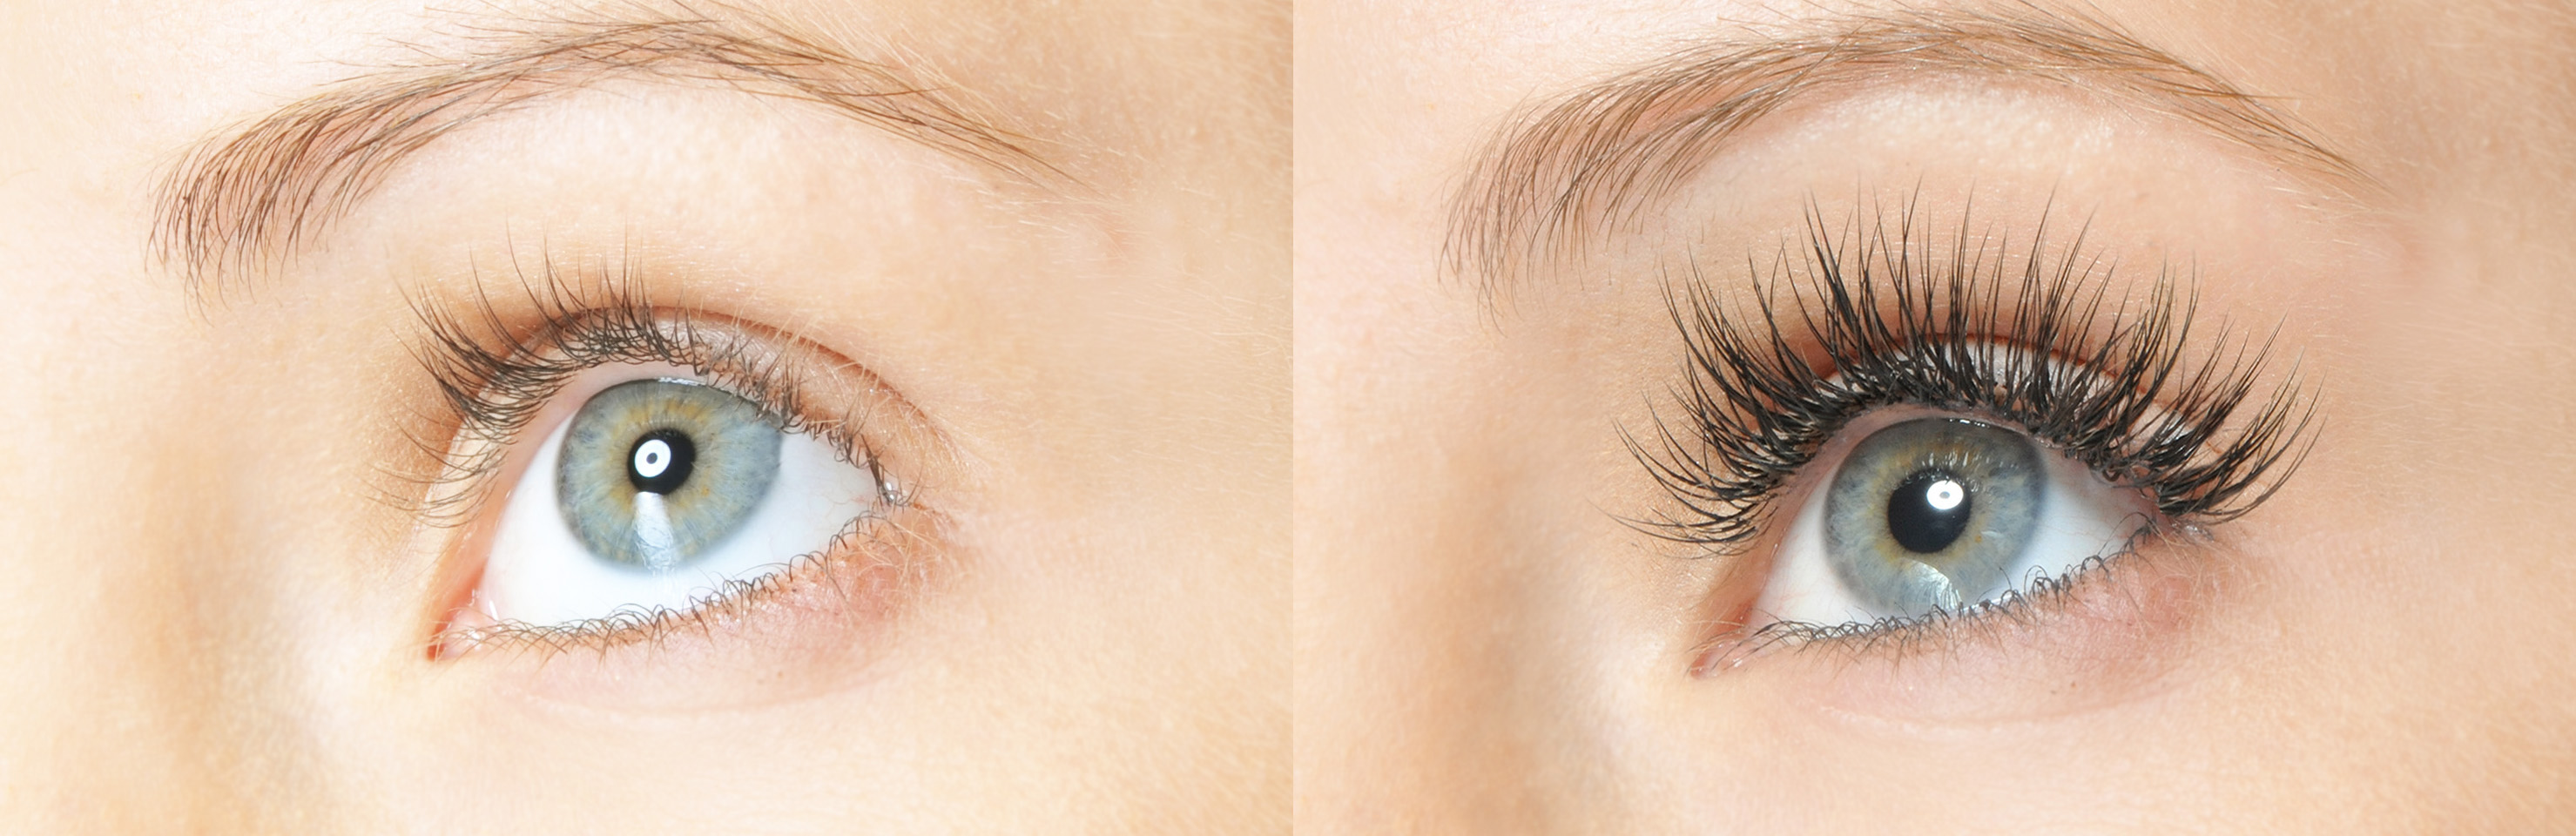 Eyelash Extensions | Arviv Medical Aesthetics